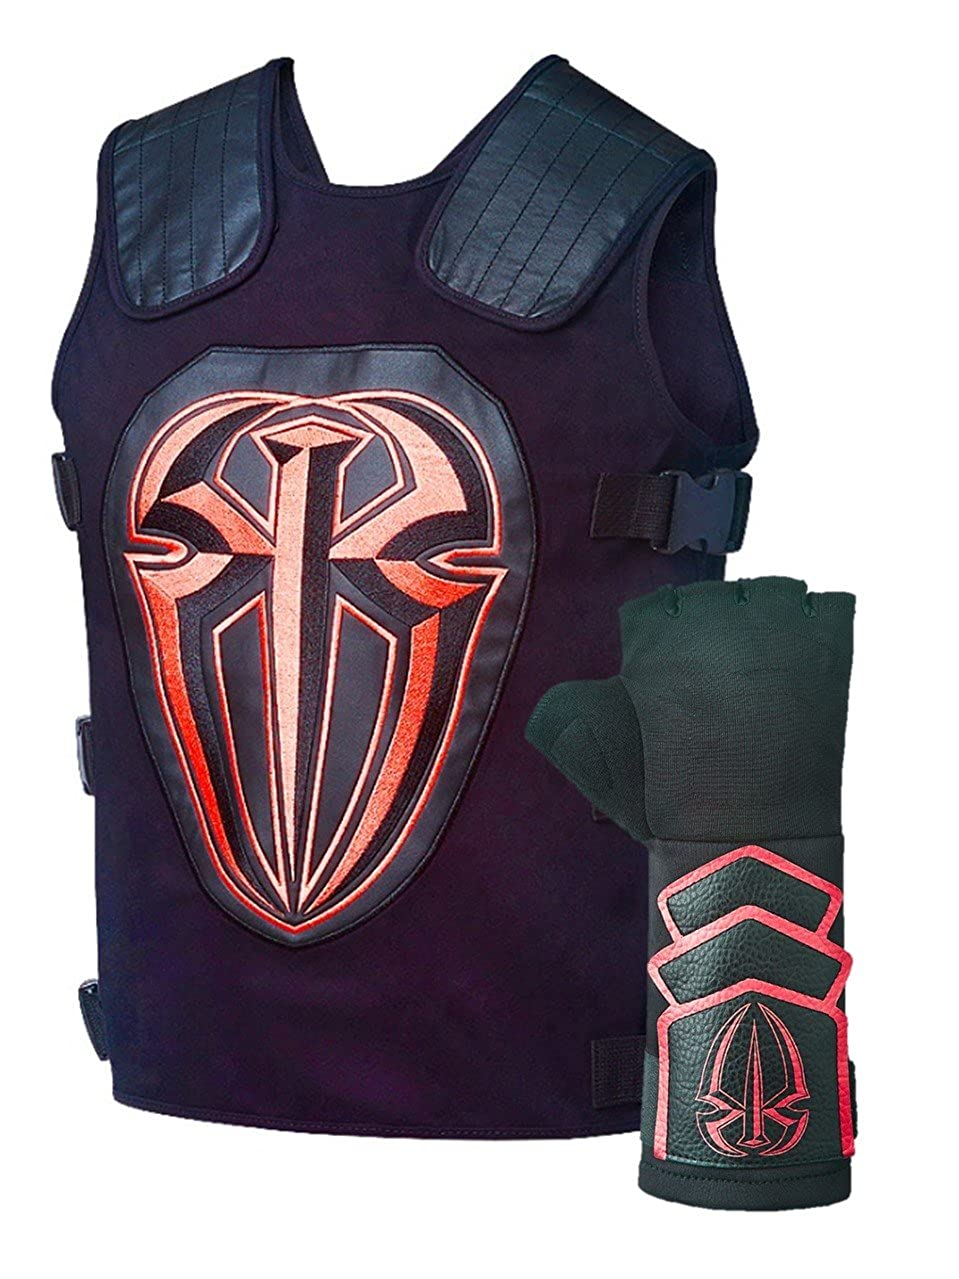 05fc910ba8271 Amazon.com  Roman Reigns Tactical Replica Vest Superman Punch Glove Costume-Black   Clothing